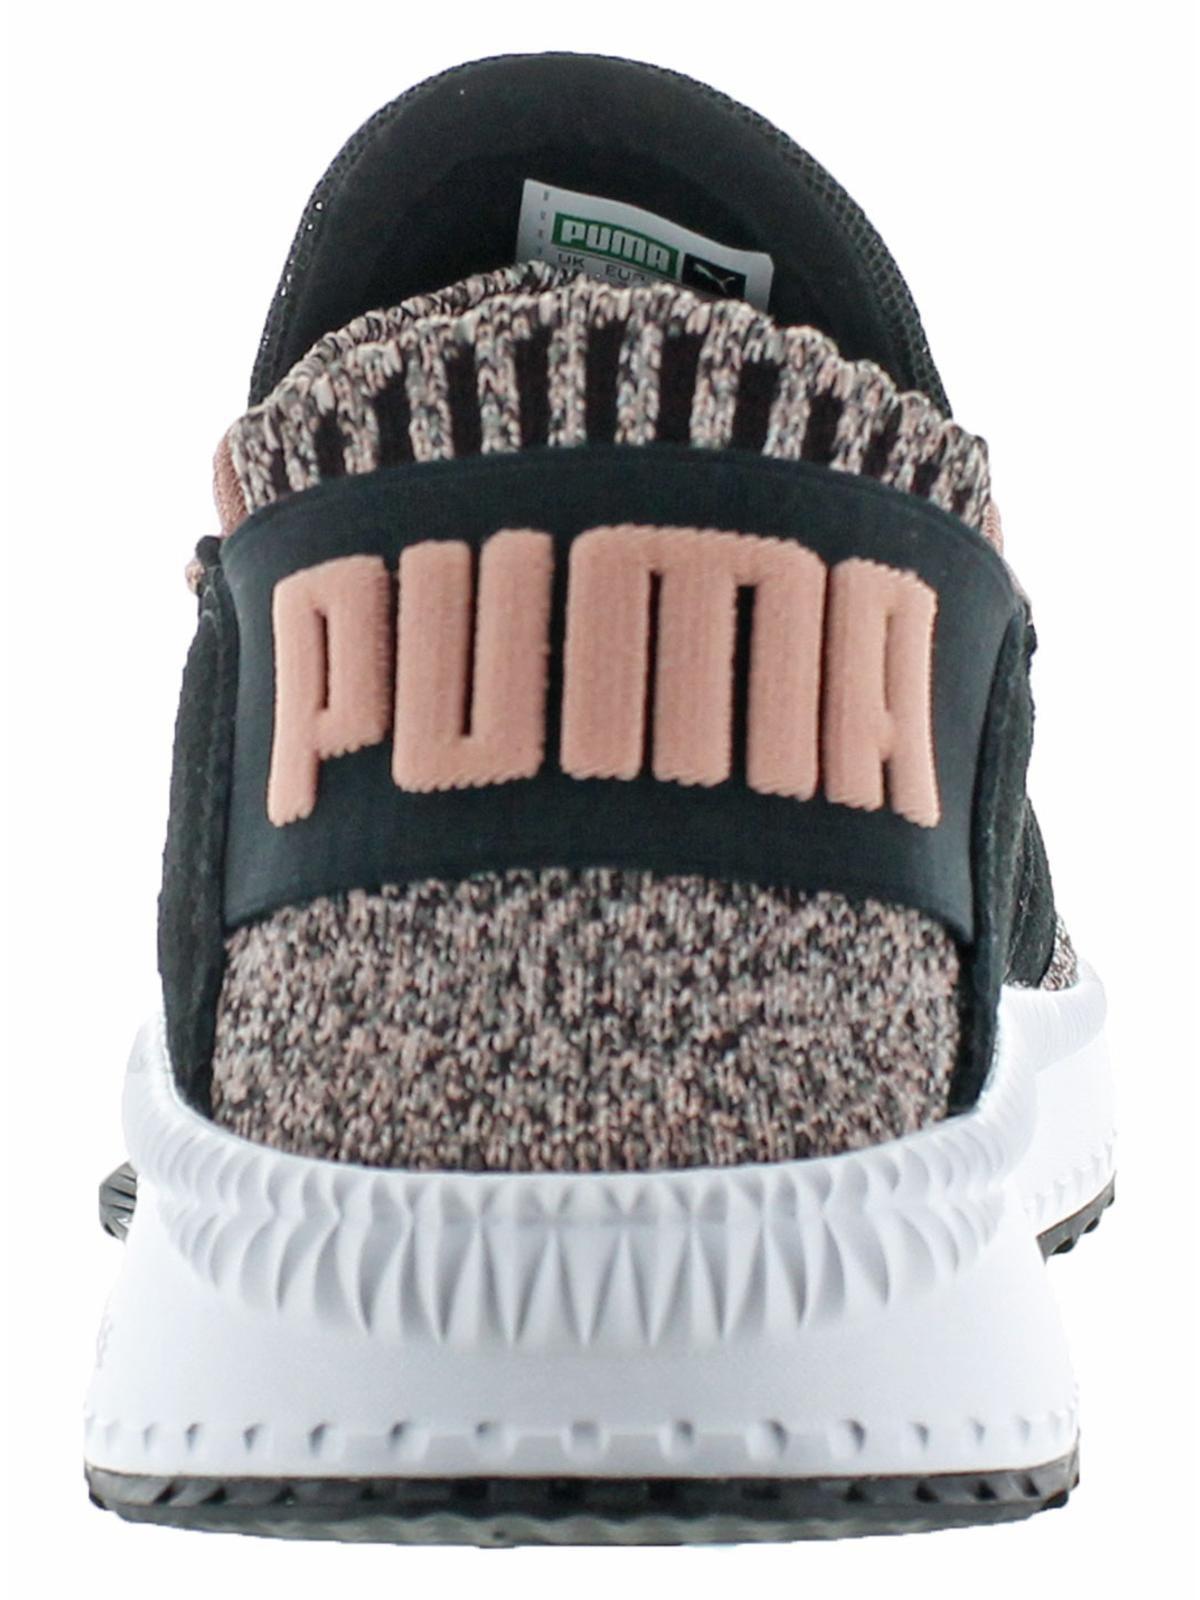 283a50370e0 PUMA - Puma Womens TSUGI Shinsei evoKNIT Lightweight Casual Fashion Sneakers  - Walmart.com